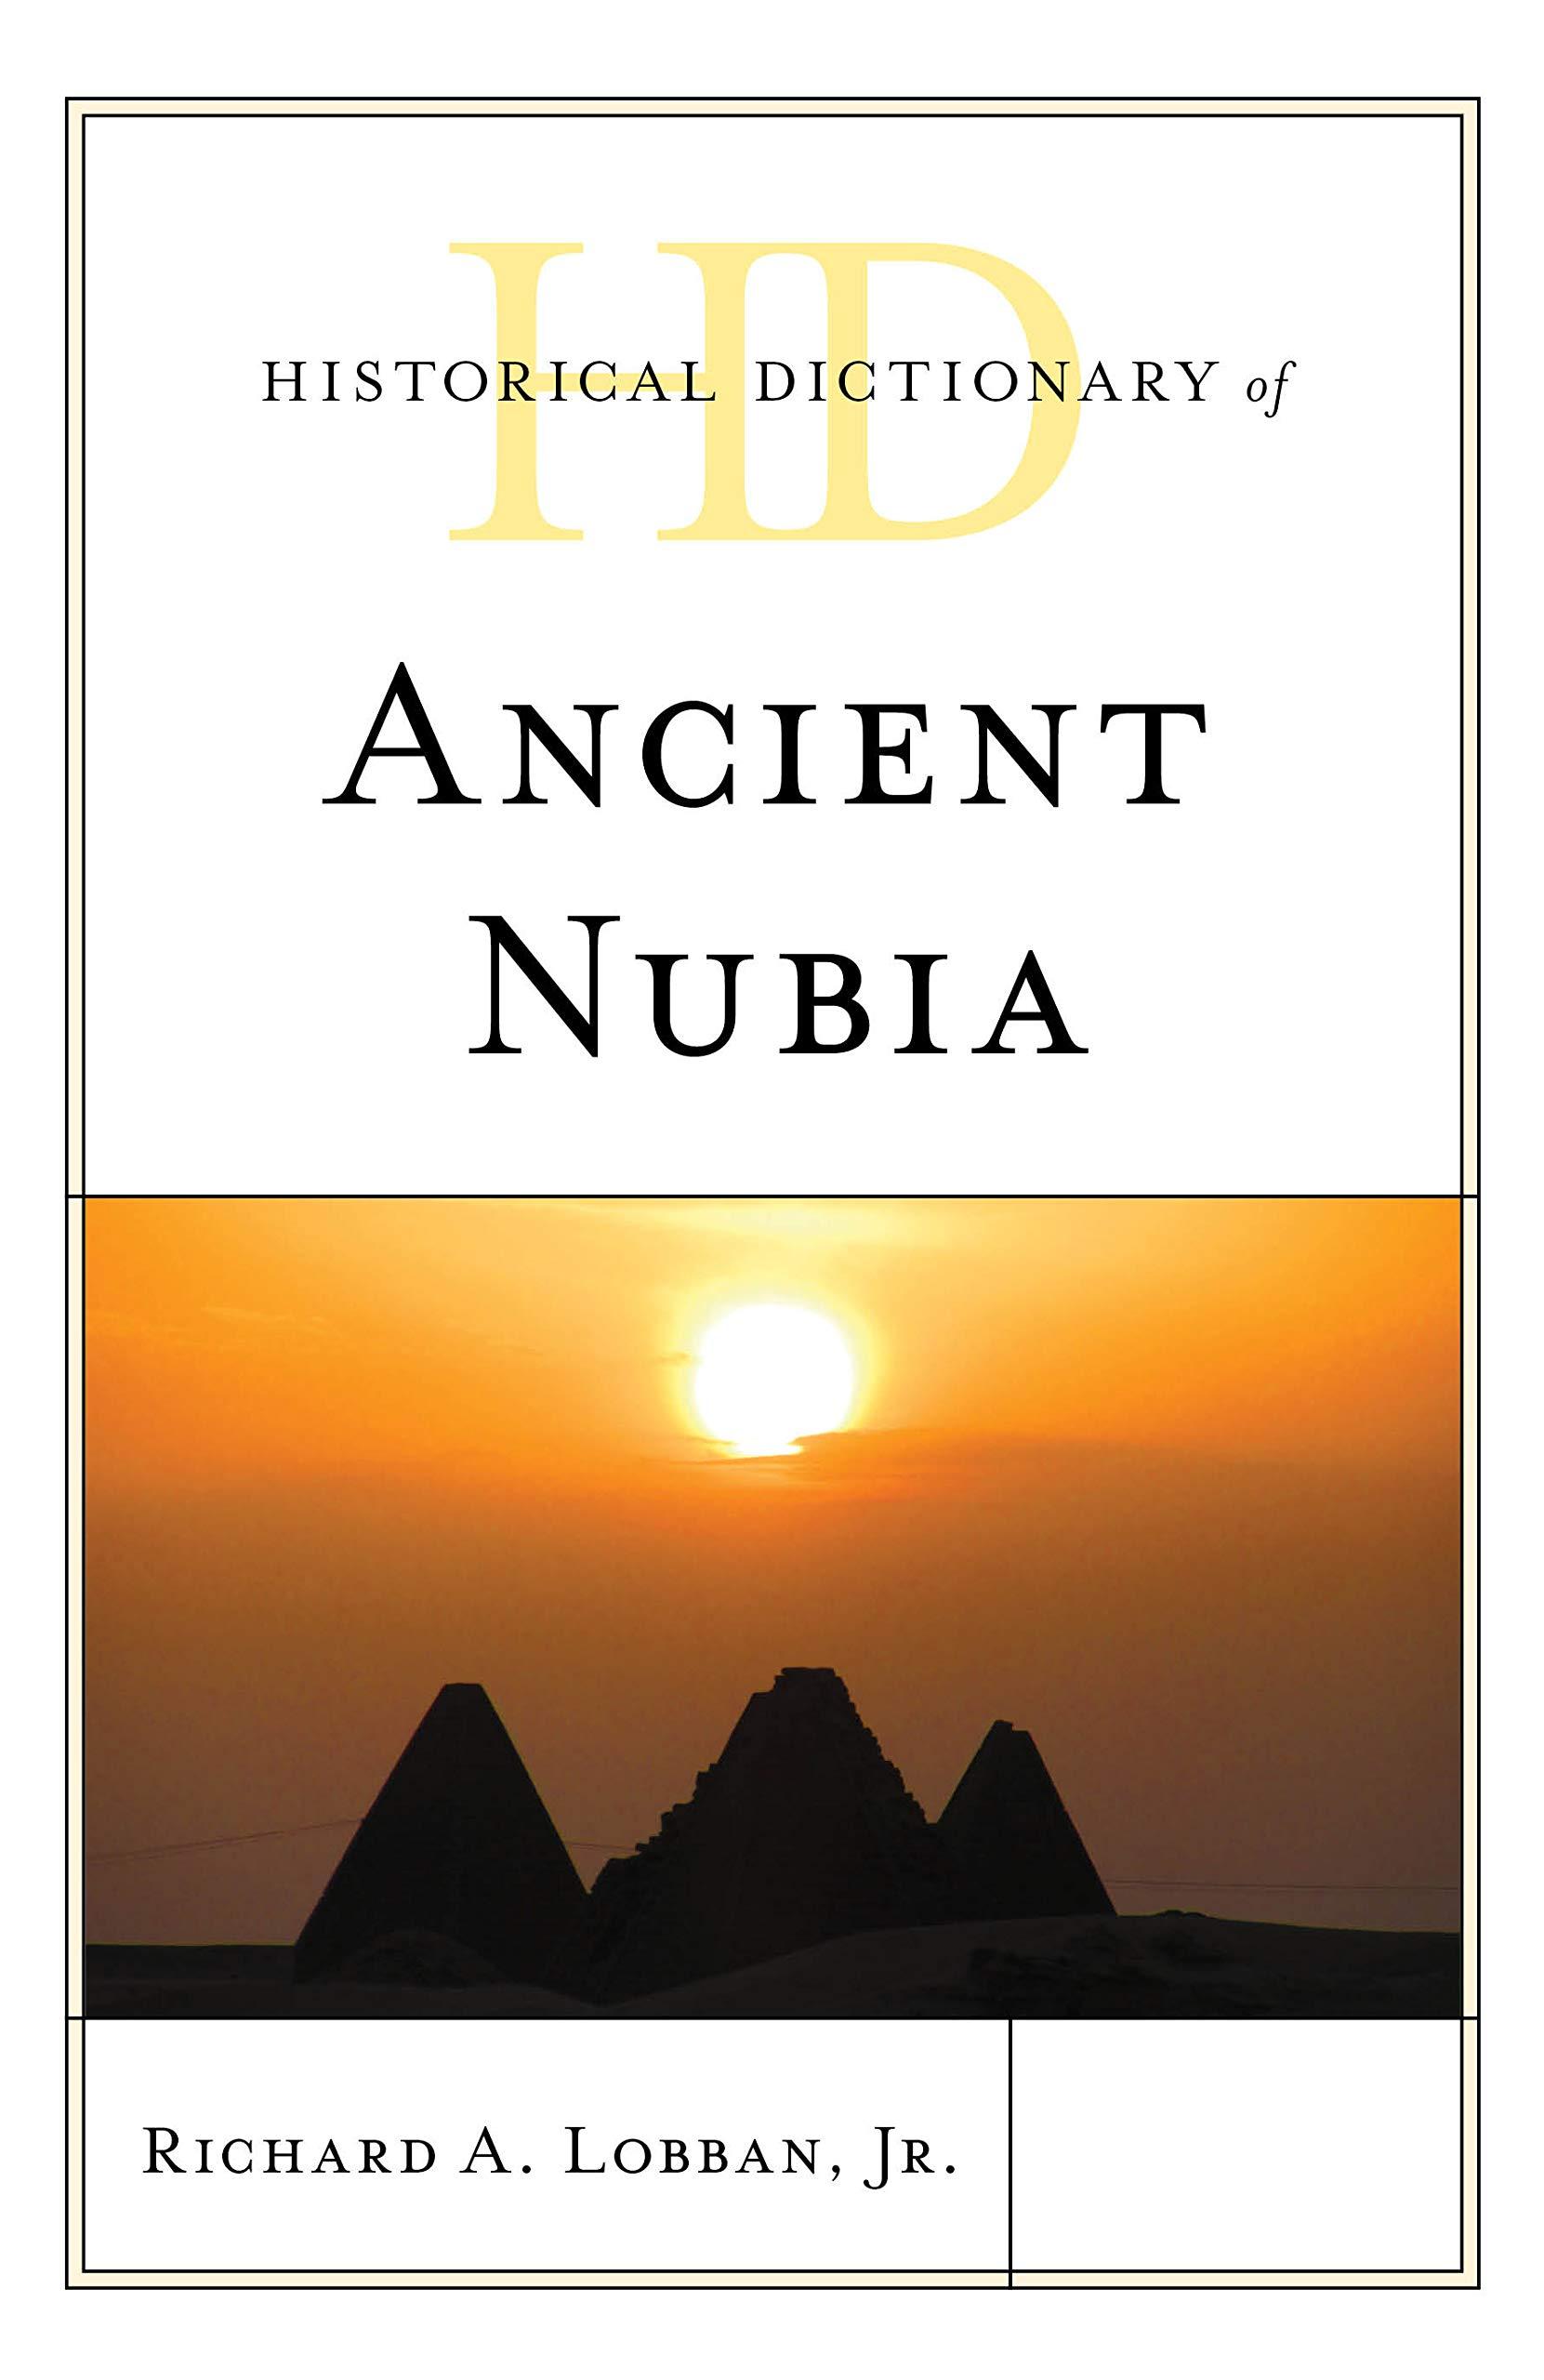 Historical Dictionary of Ancient Nubia (Historical Dictionaries of Ancient  Civilizations and Historical Eras): Amazon.co.uk: Richard A. Lobban Jr.:  9781538133385: Books